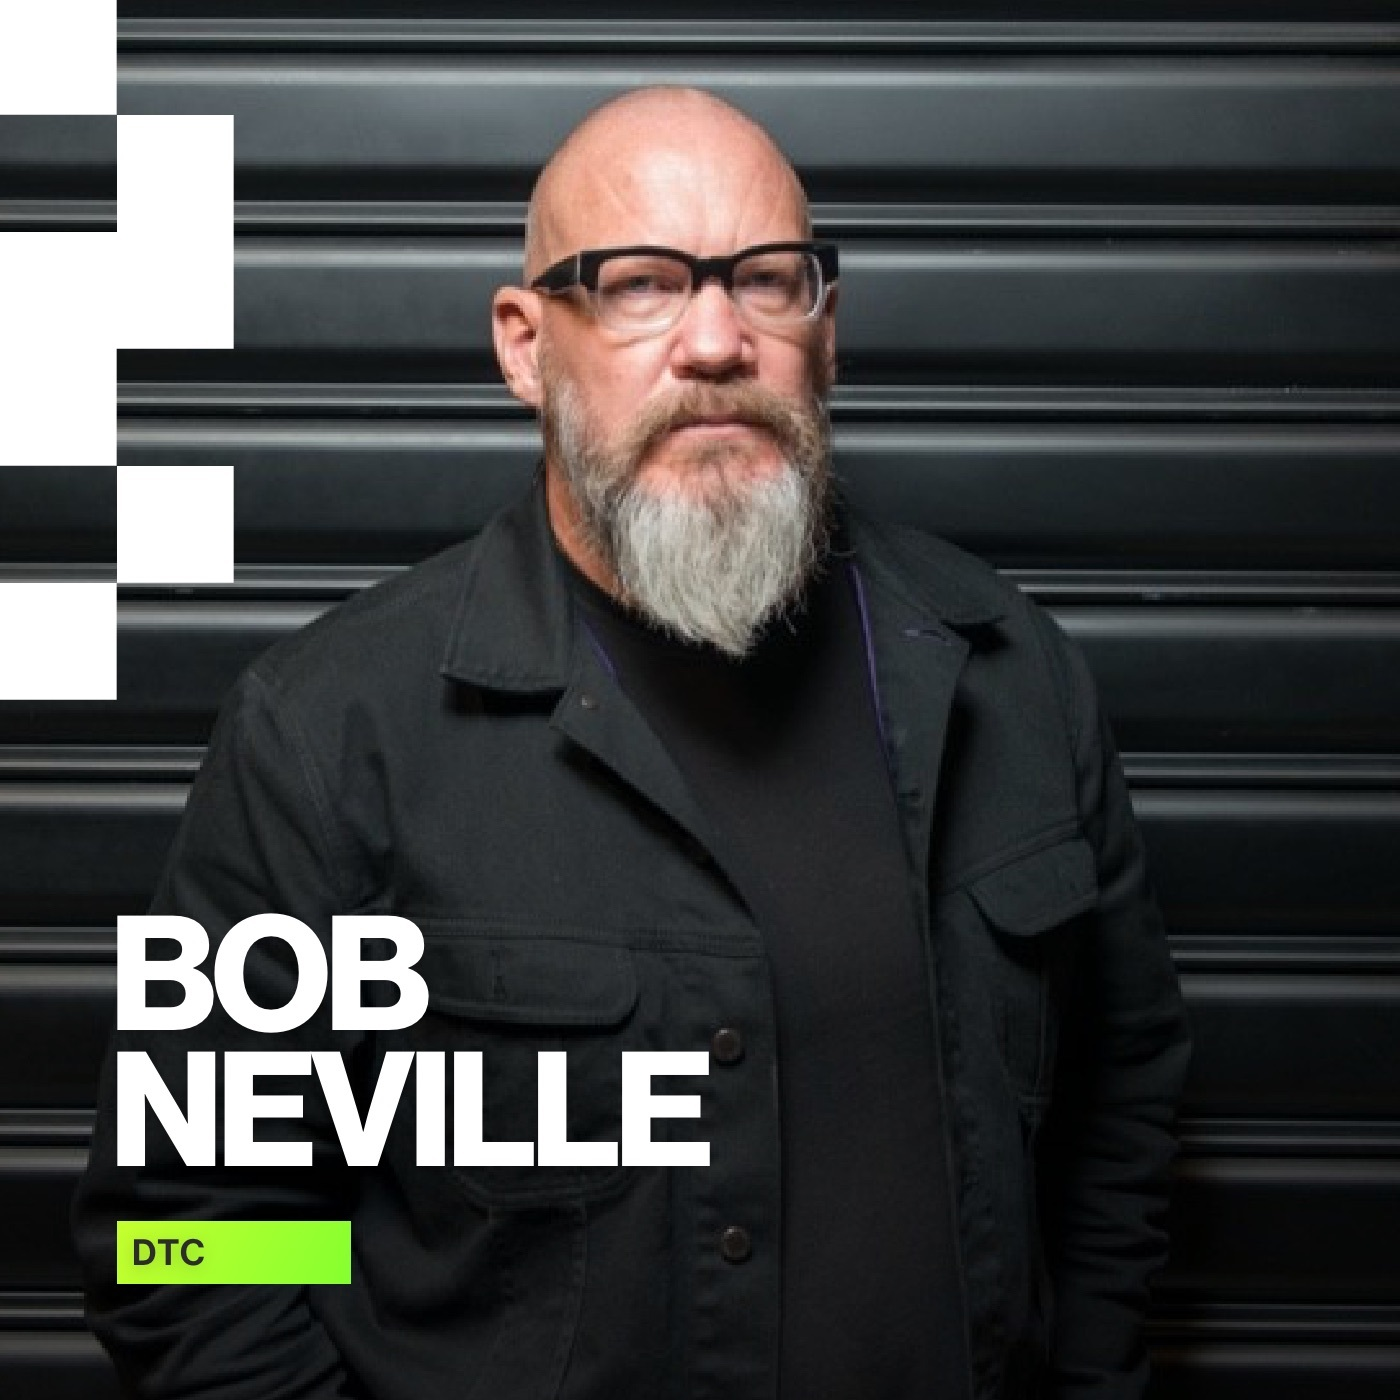 Bob Neville